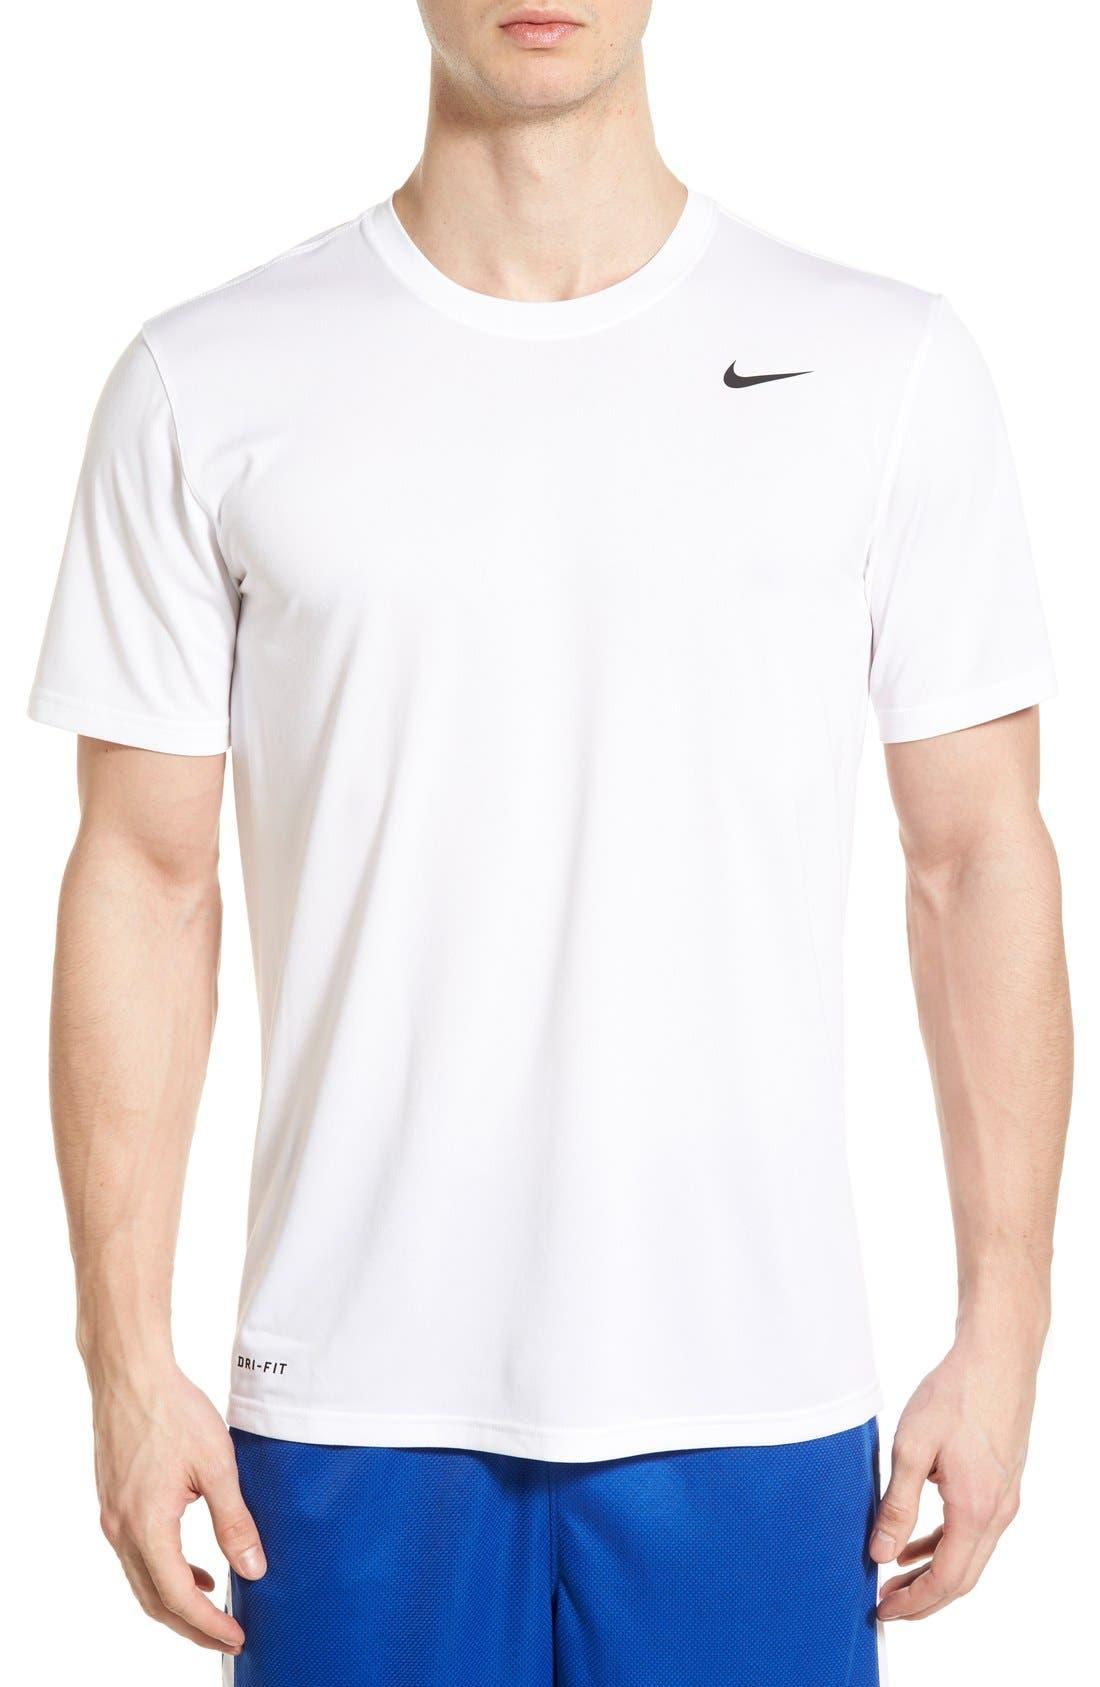 Nike 'Legend 2.0' Dri-FIT Training T-Shirt (Regular Retail Price: $25.00)